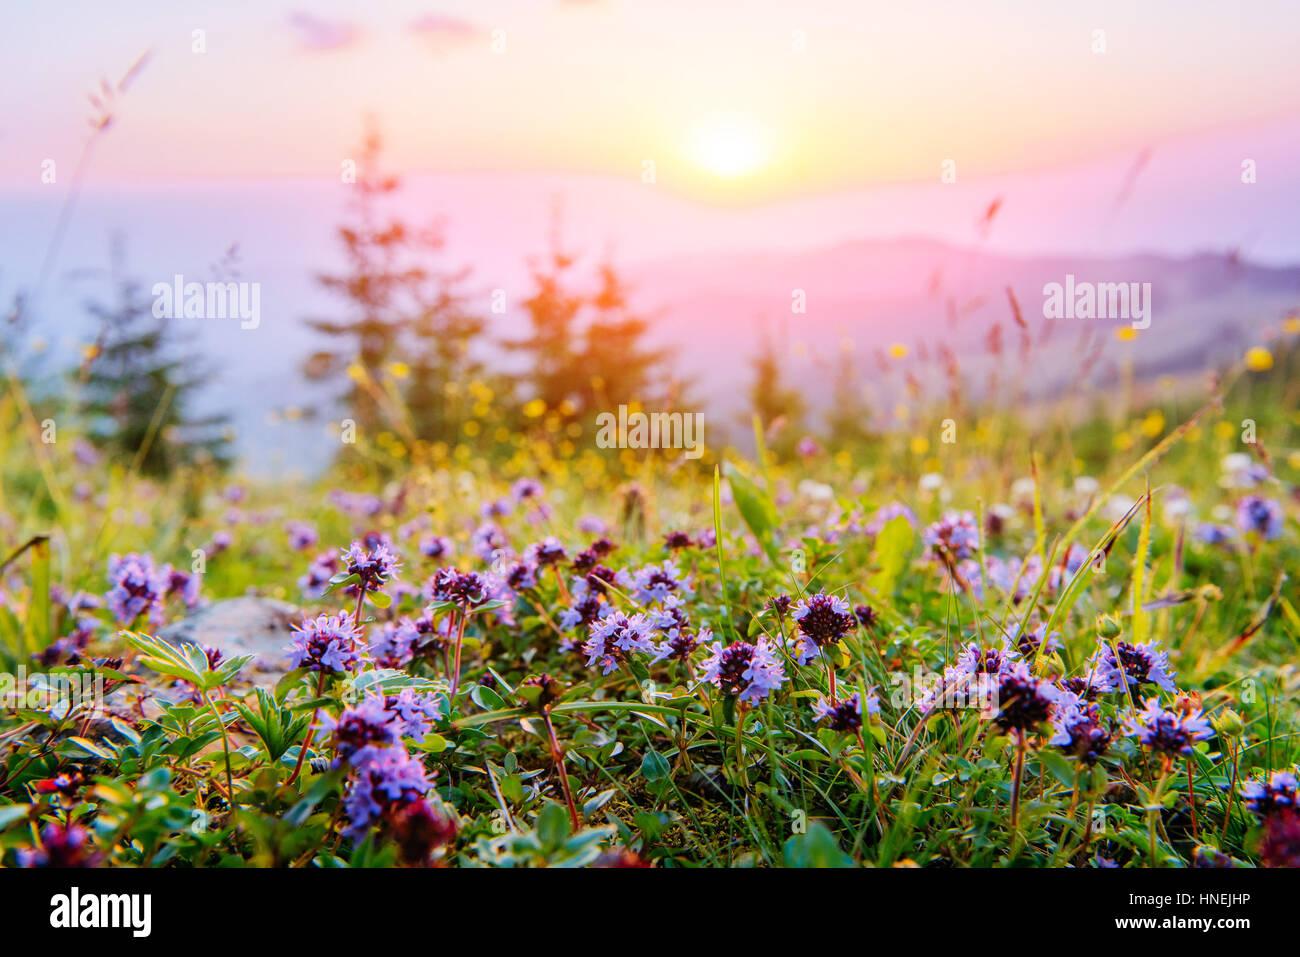 Flores silvestres en las montañas al atardecer Imagen De Stock